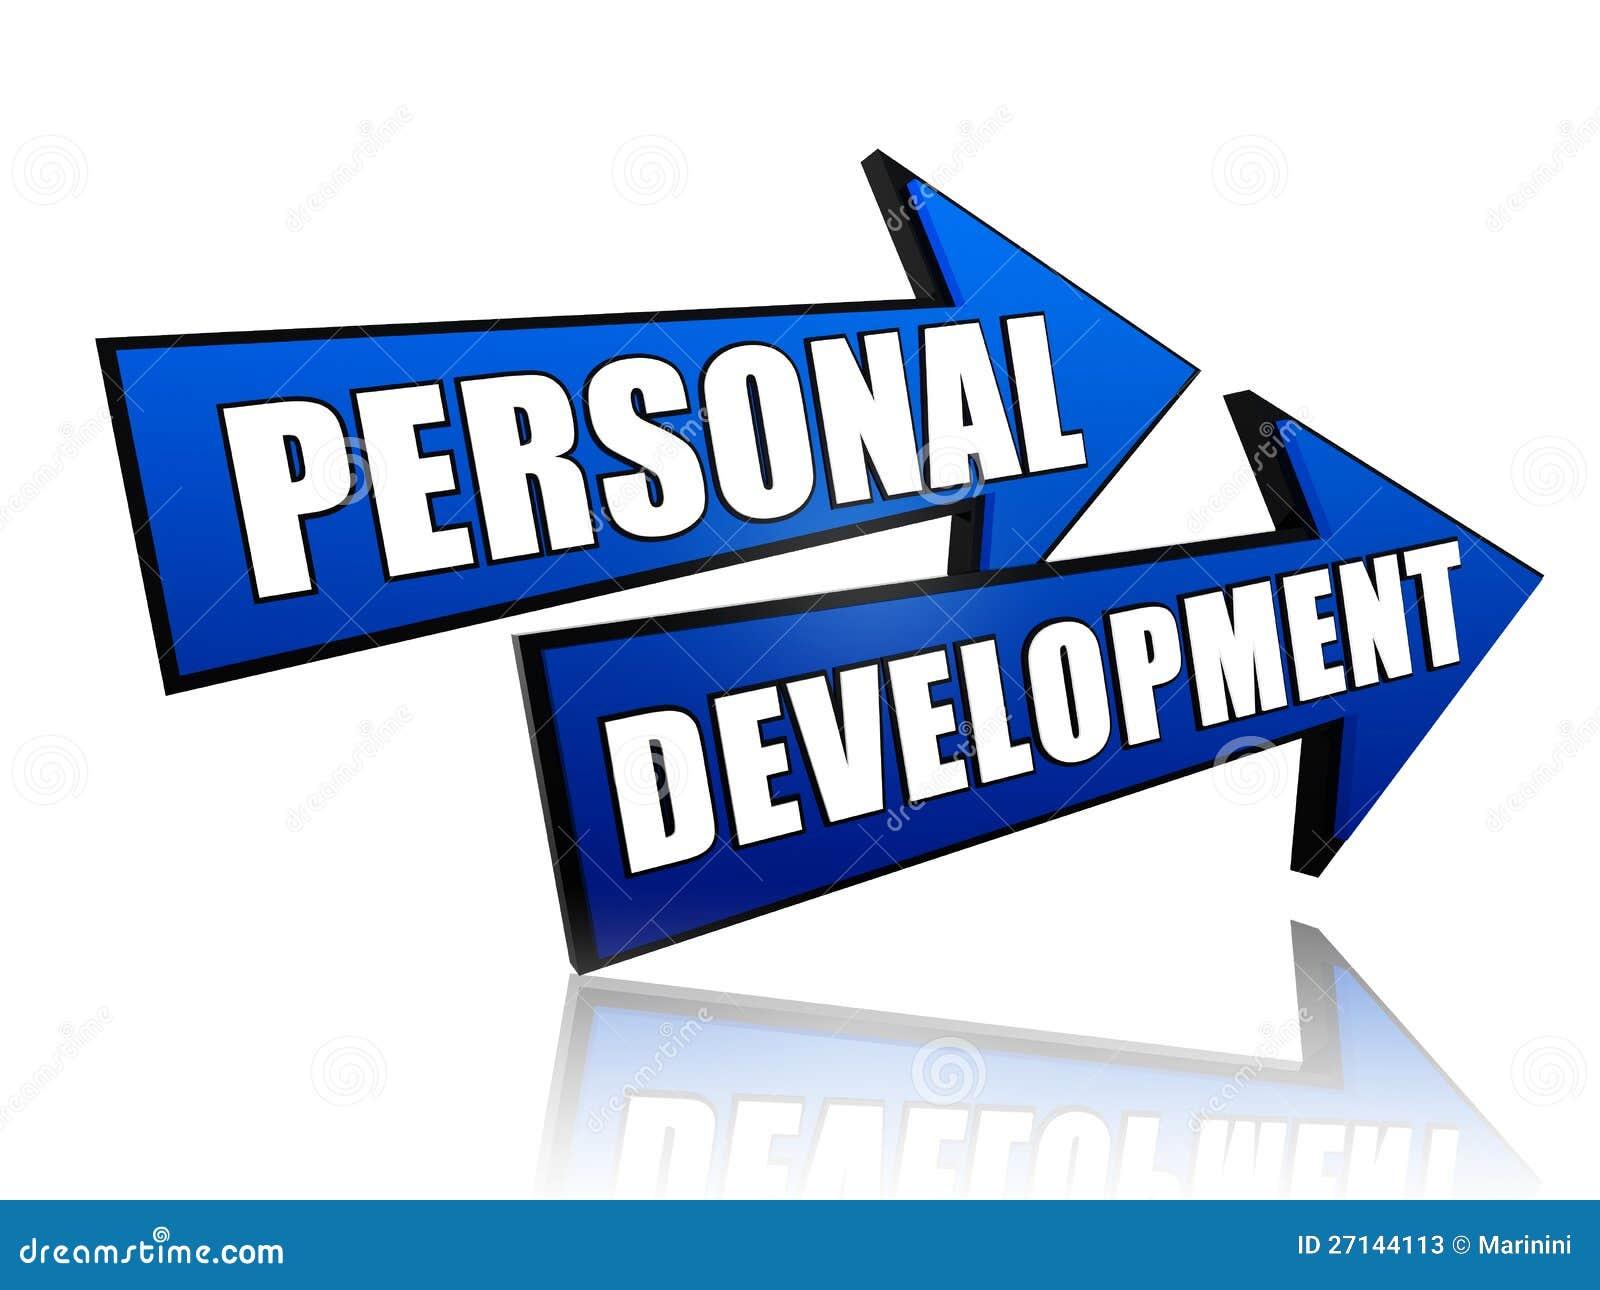 Stock Photos Personal Development Arrows Image27144113